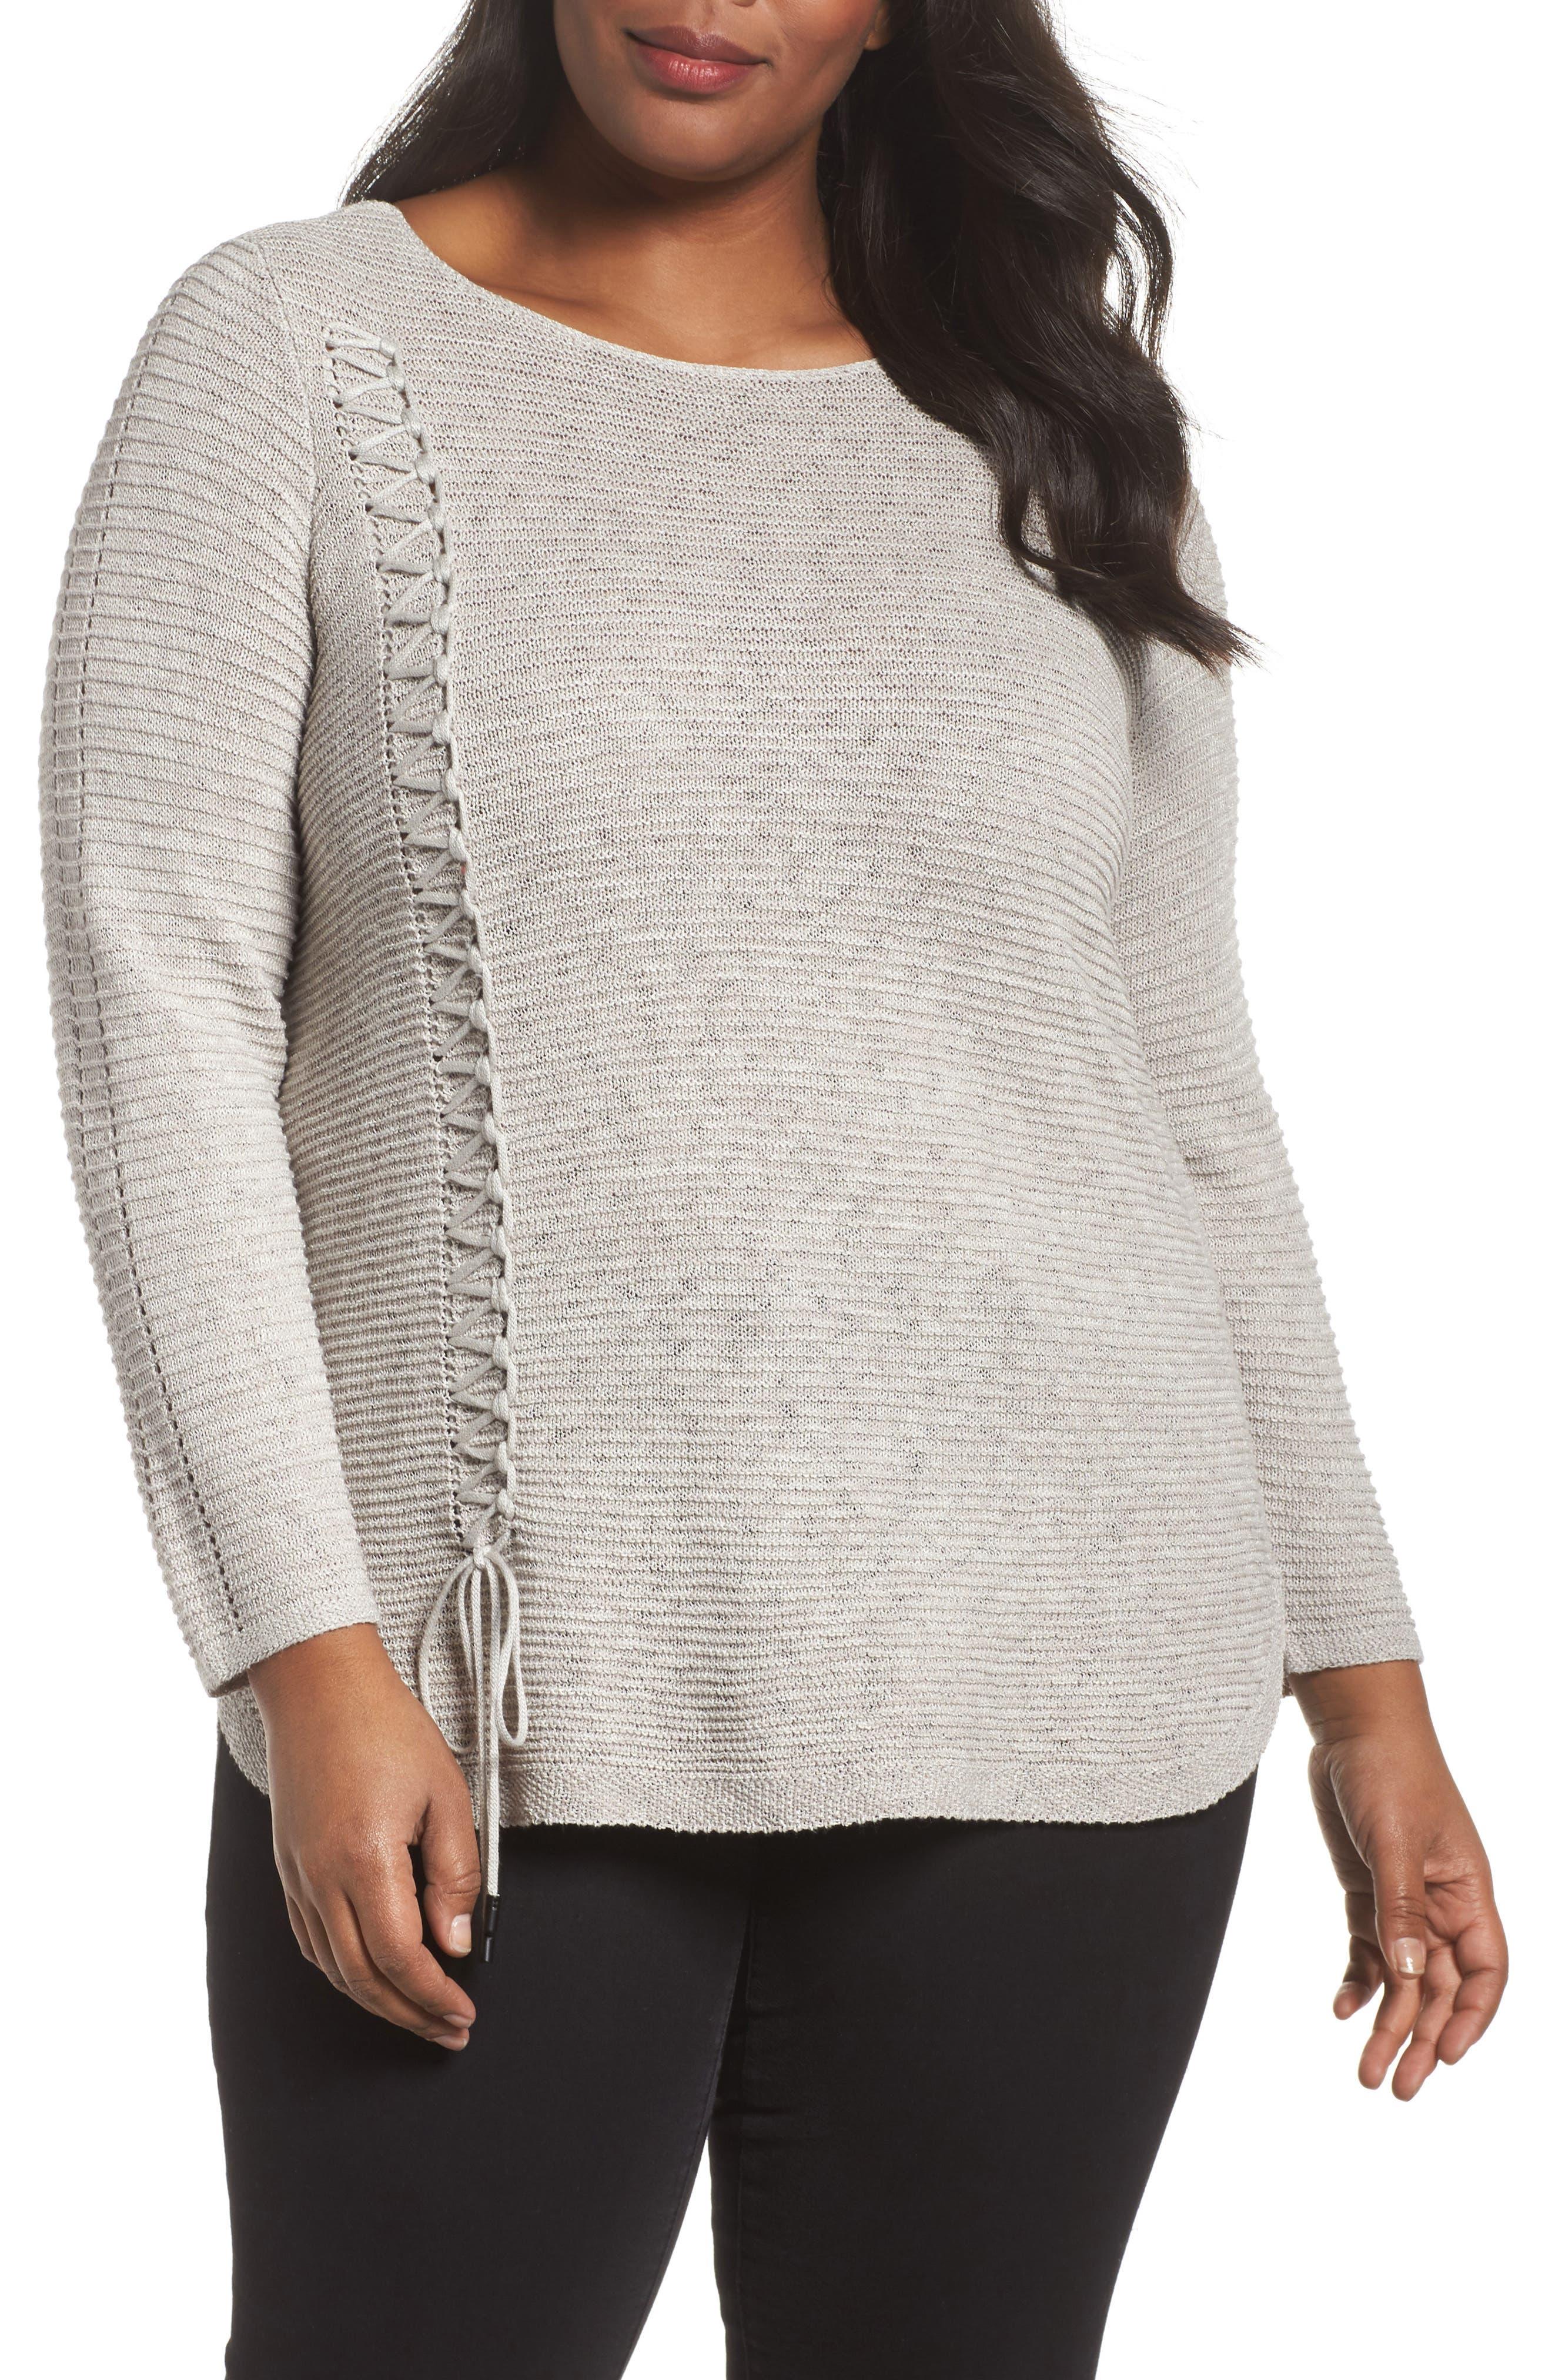 Alternate Image 1 Selected - NIC+ZOE Braided Up Sweater (Plus Size)